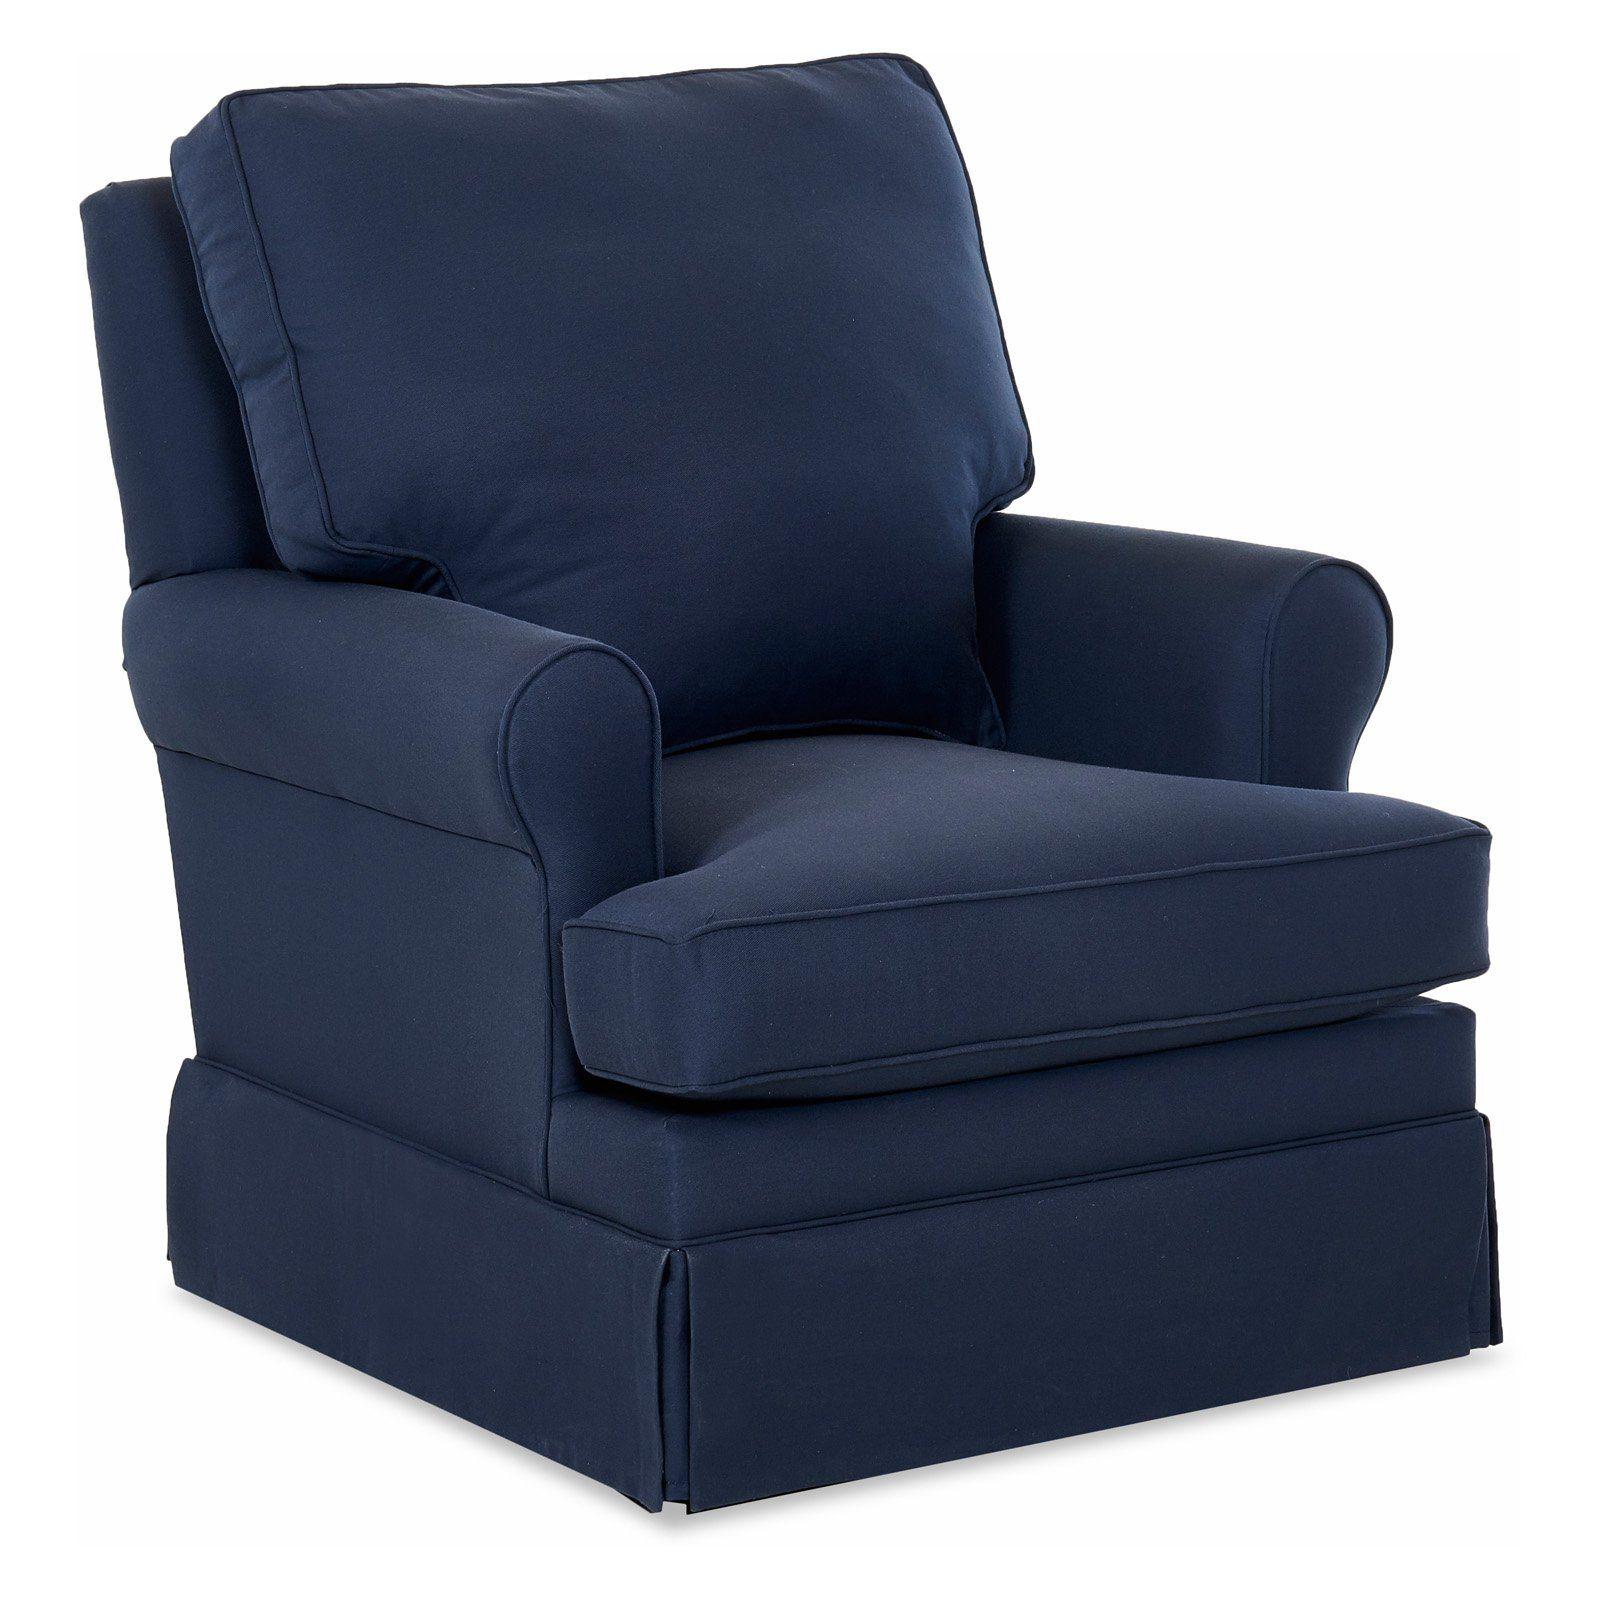 Groovy Klaussner Gwinnett Swivel Gliding Rocker Indigo Spinnsol Lamtechconsult Wood Chair Design Ideas Lamtechconsultcom